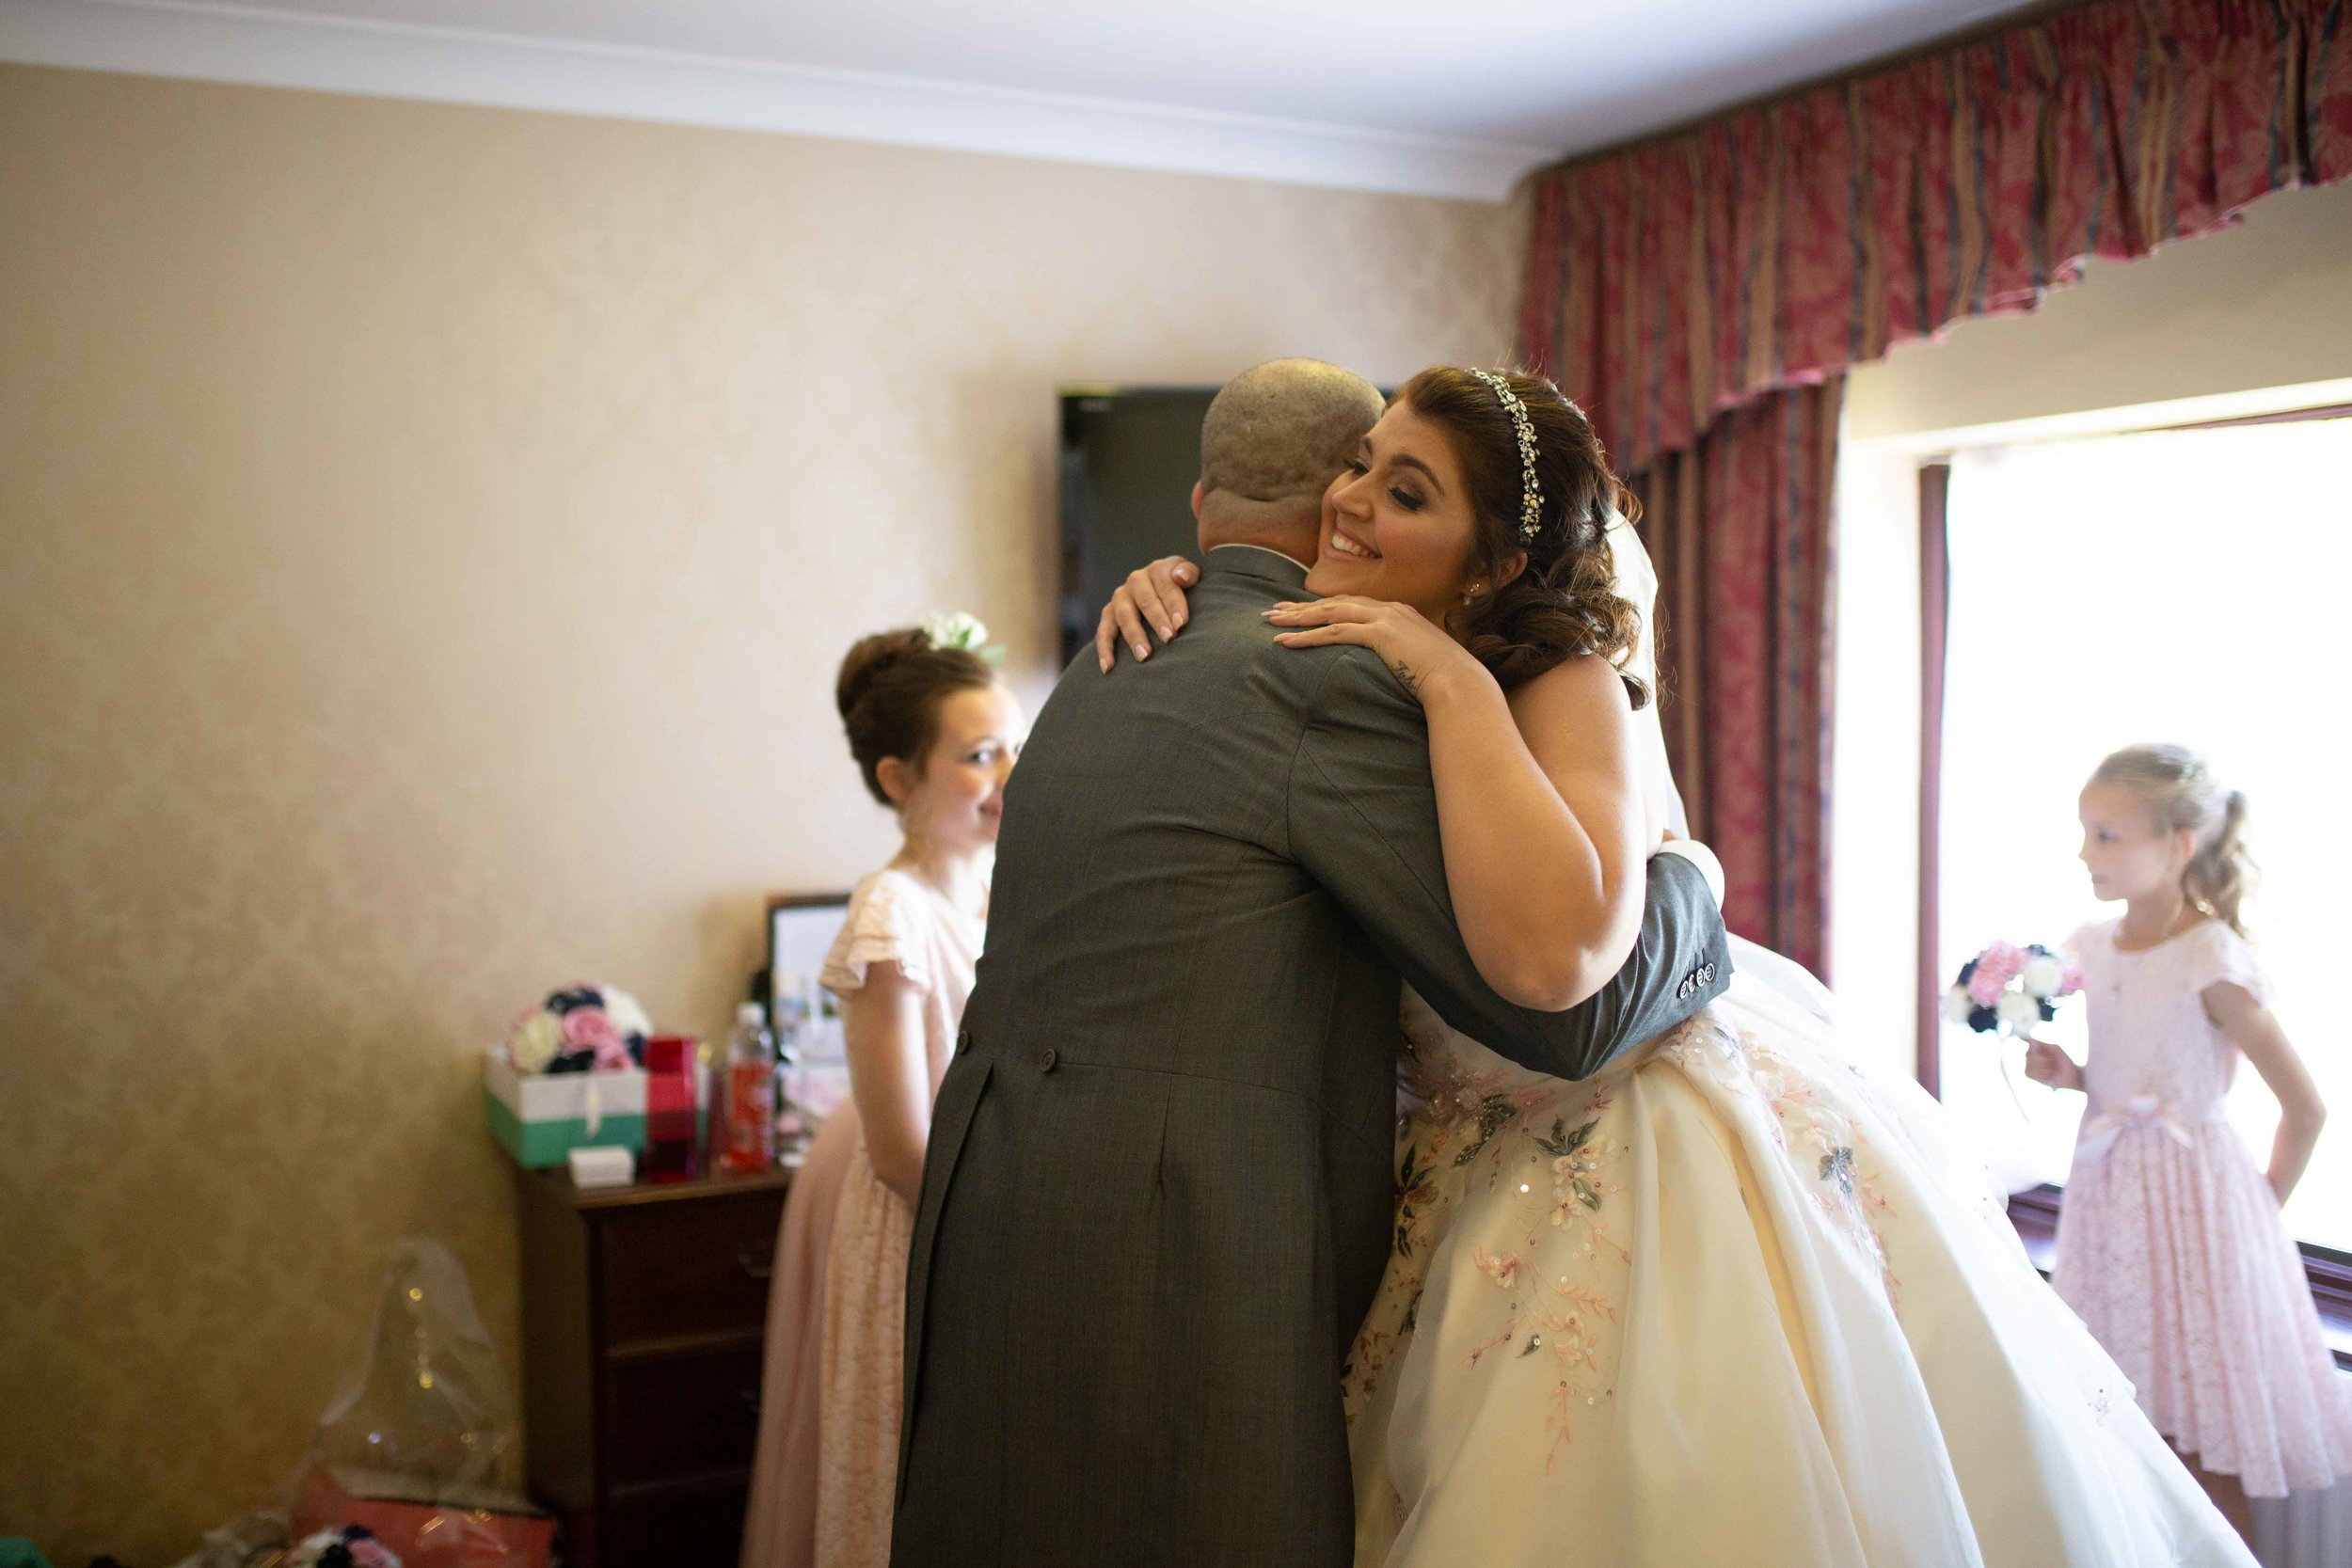 Lea-cooper-photography-wedding-photography-wolverhampton-patshull-park-hotel-wedding-pattingham-wolverhampton-west-midlands-uk-21.JPG